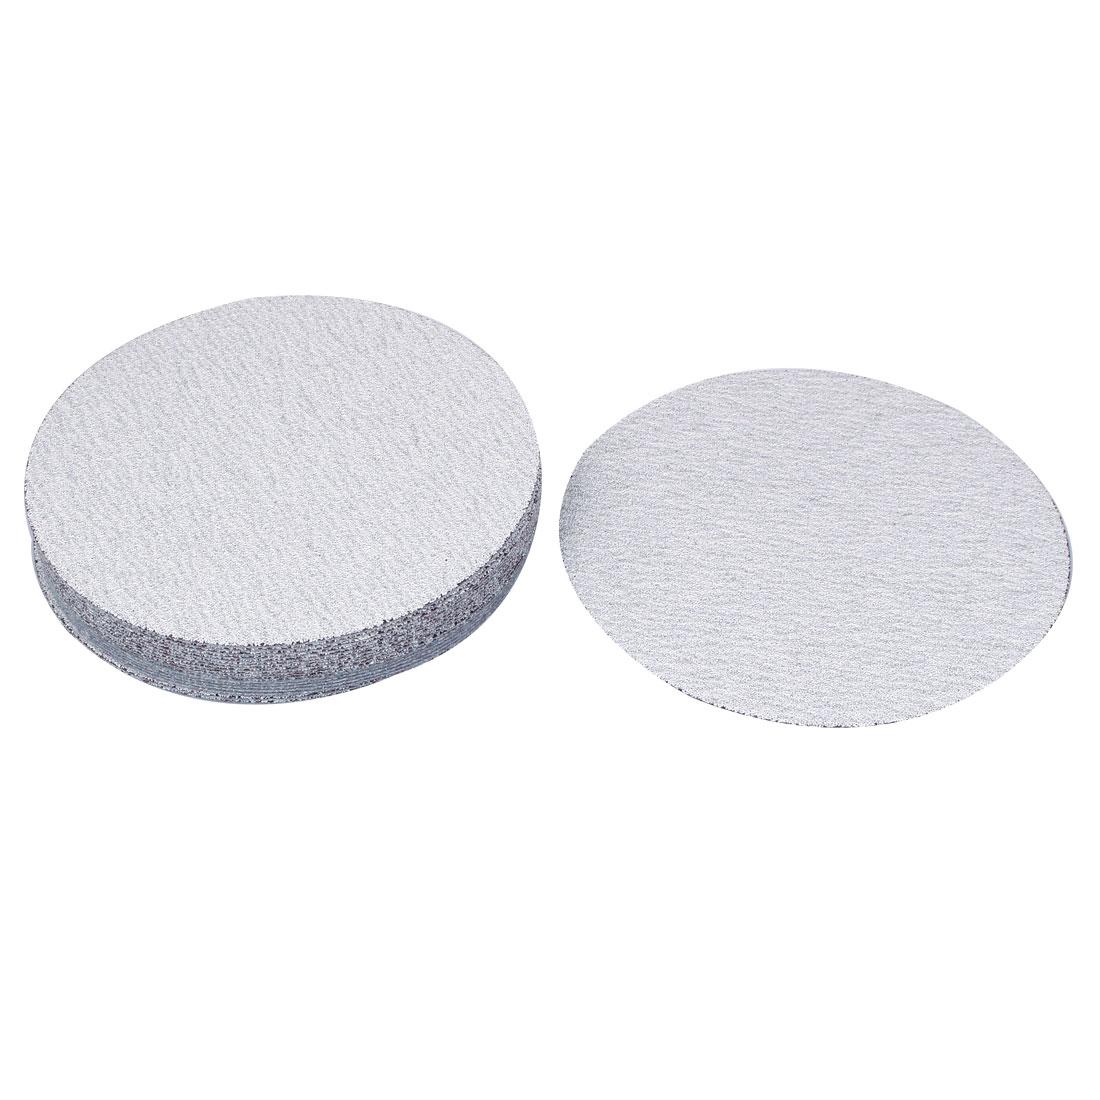 "6"" Dia Polishing Round Dry Abrasive Sanding Sandpaper Sheet Disc 80 Grit 20pcs"